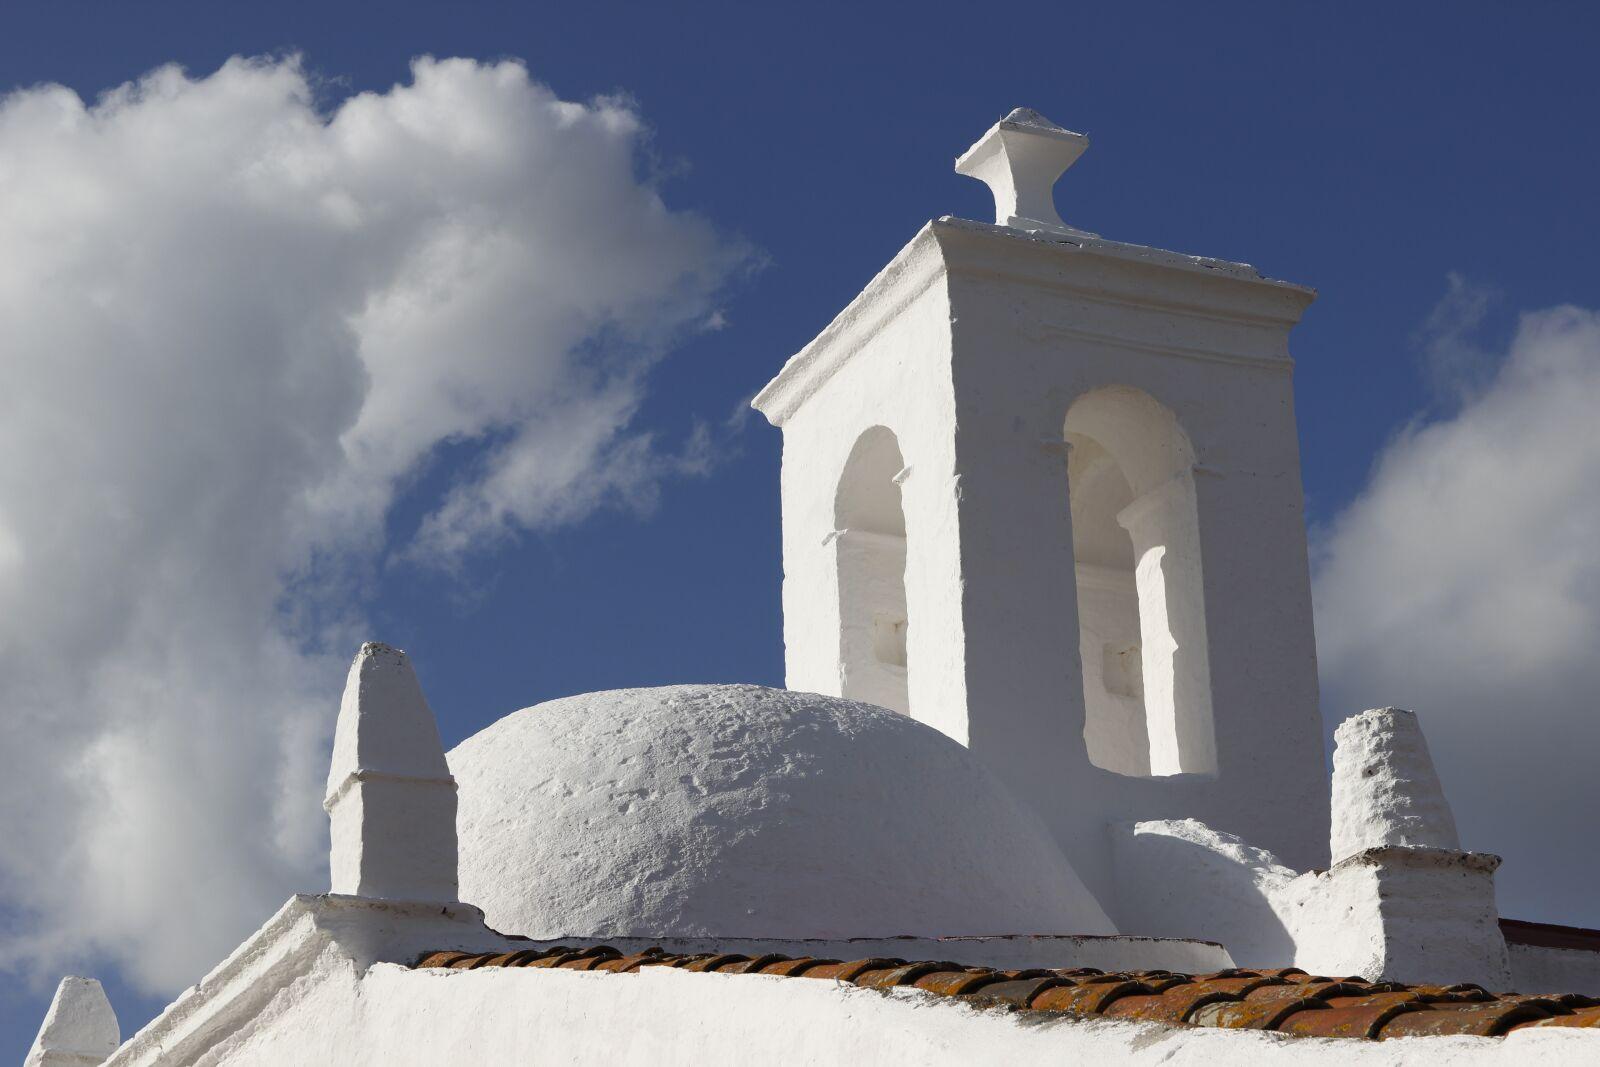 "Canon EOS 600D (Rebel EOS T3i / EOS Kiss X5) sample photo. ""Sky, hermitage, church"" photography"